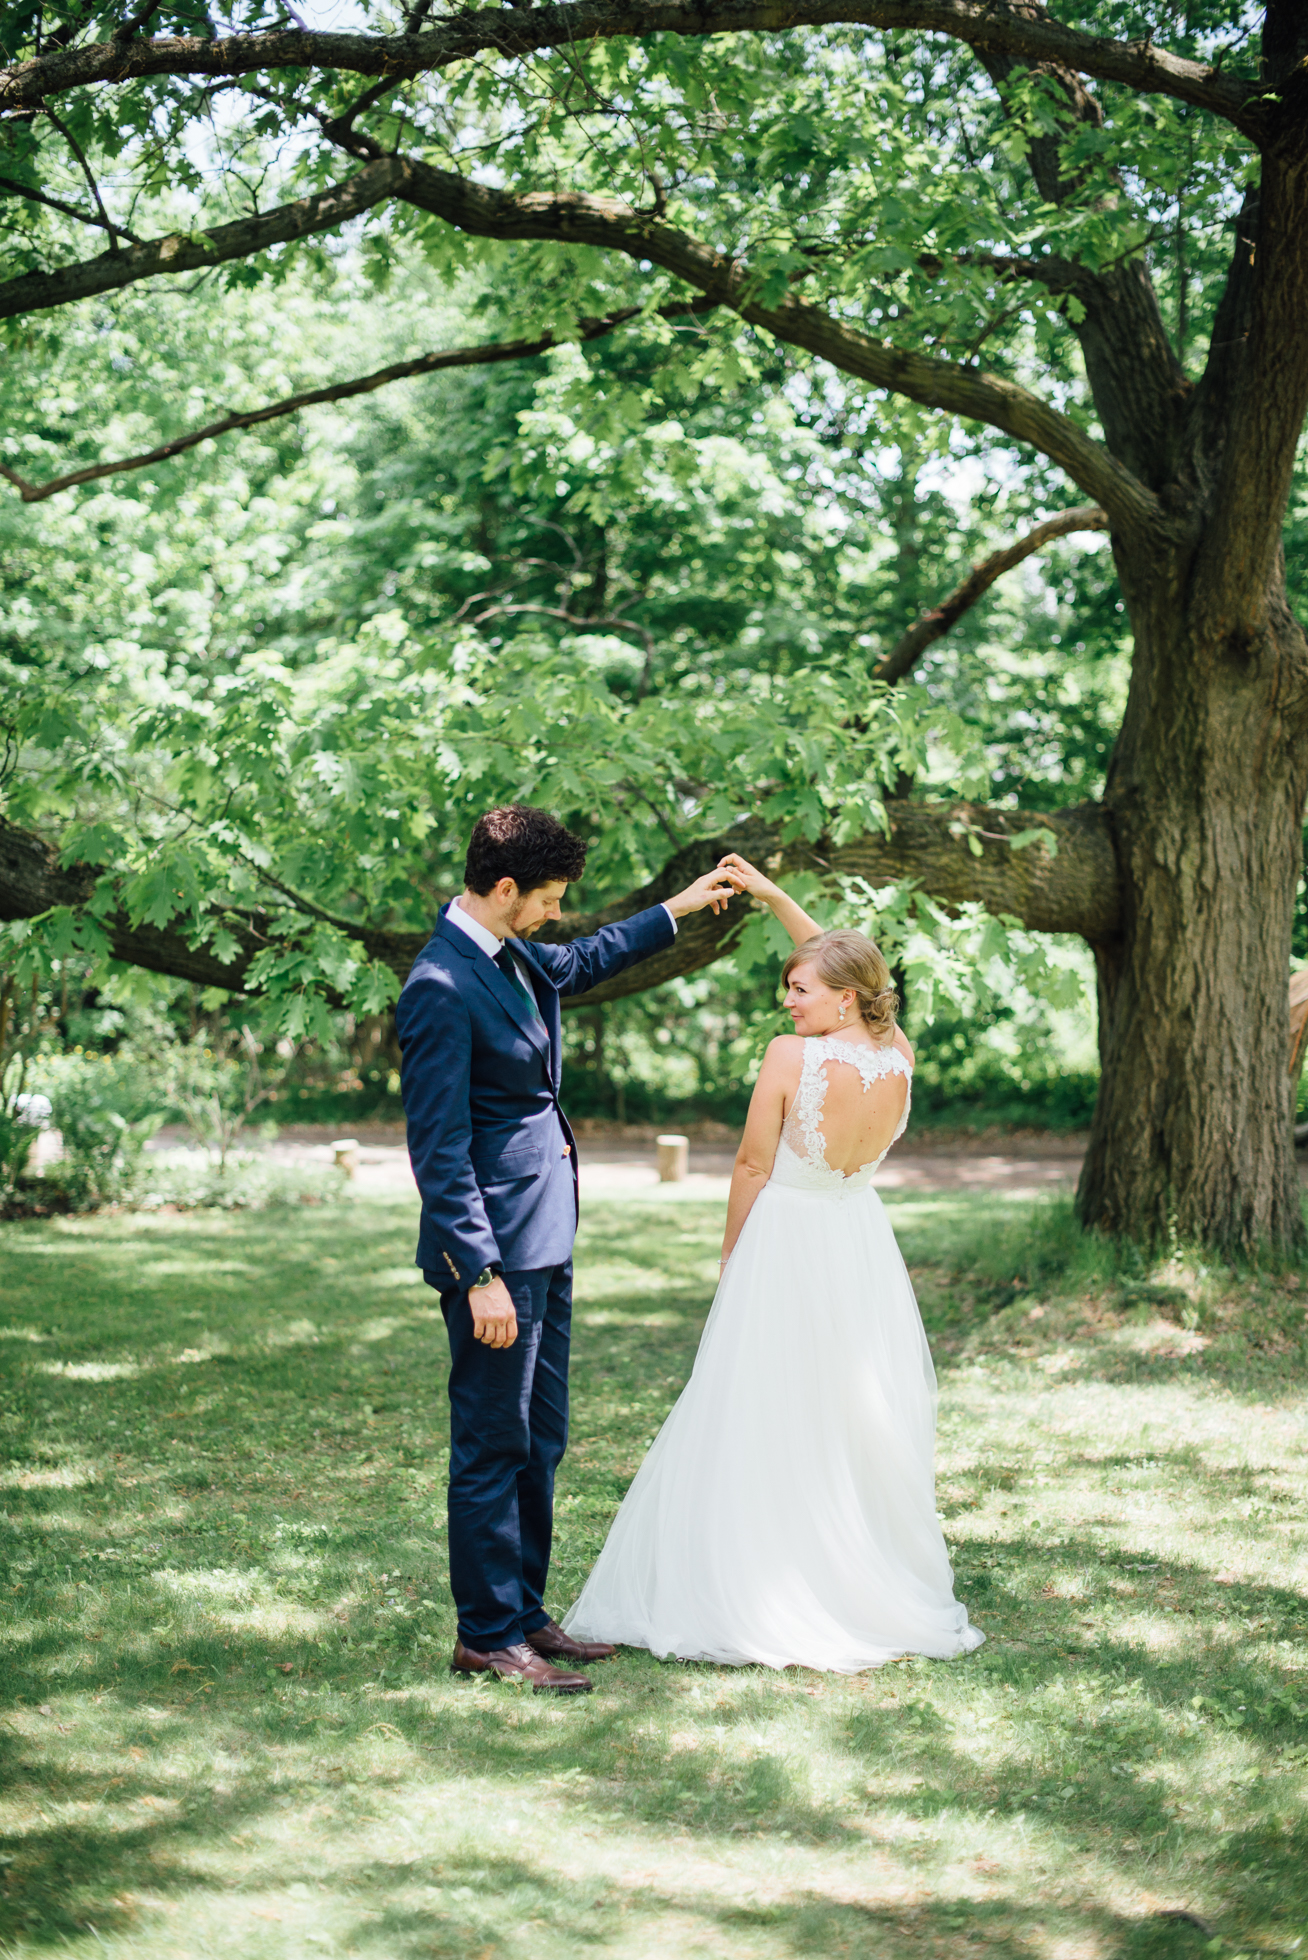 Outdoor-Caledon-Tralee-Wedding-Photography-33